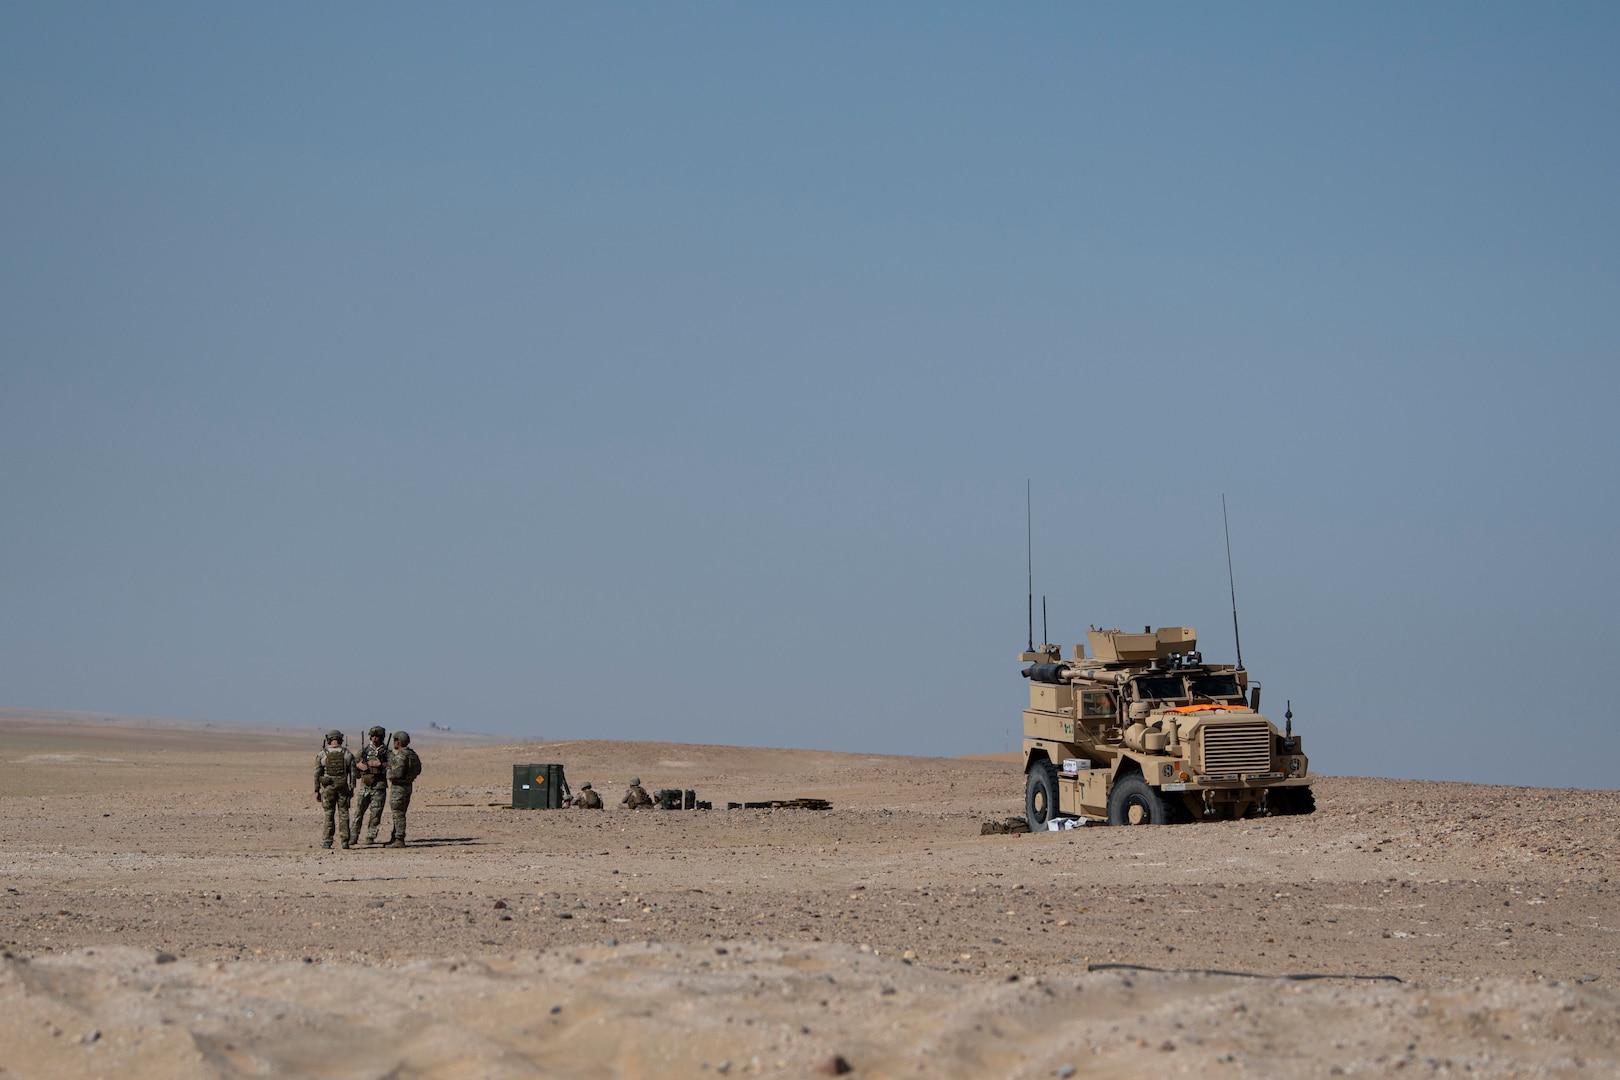 A photo of U.S. service members walking